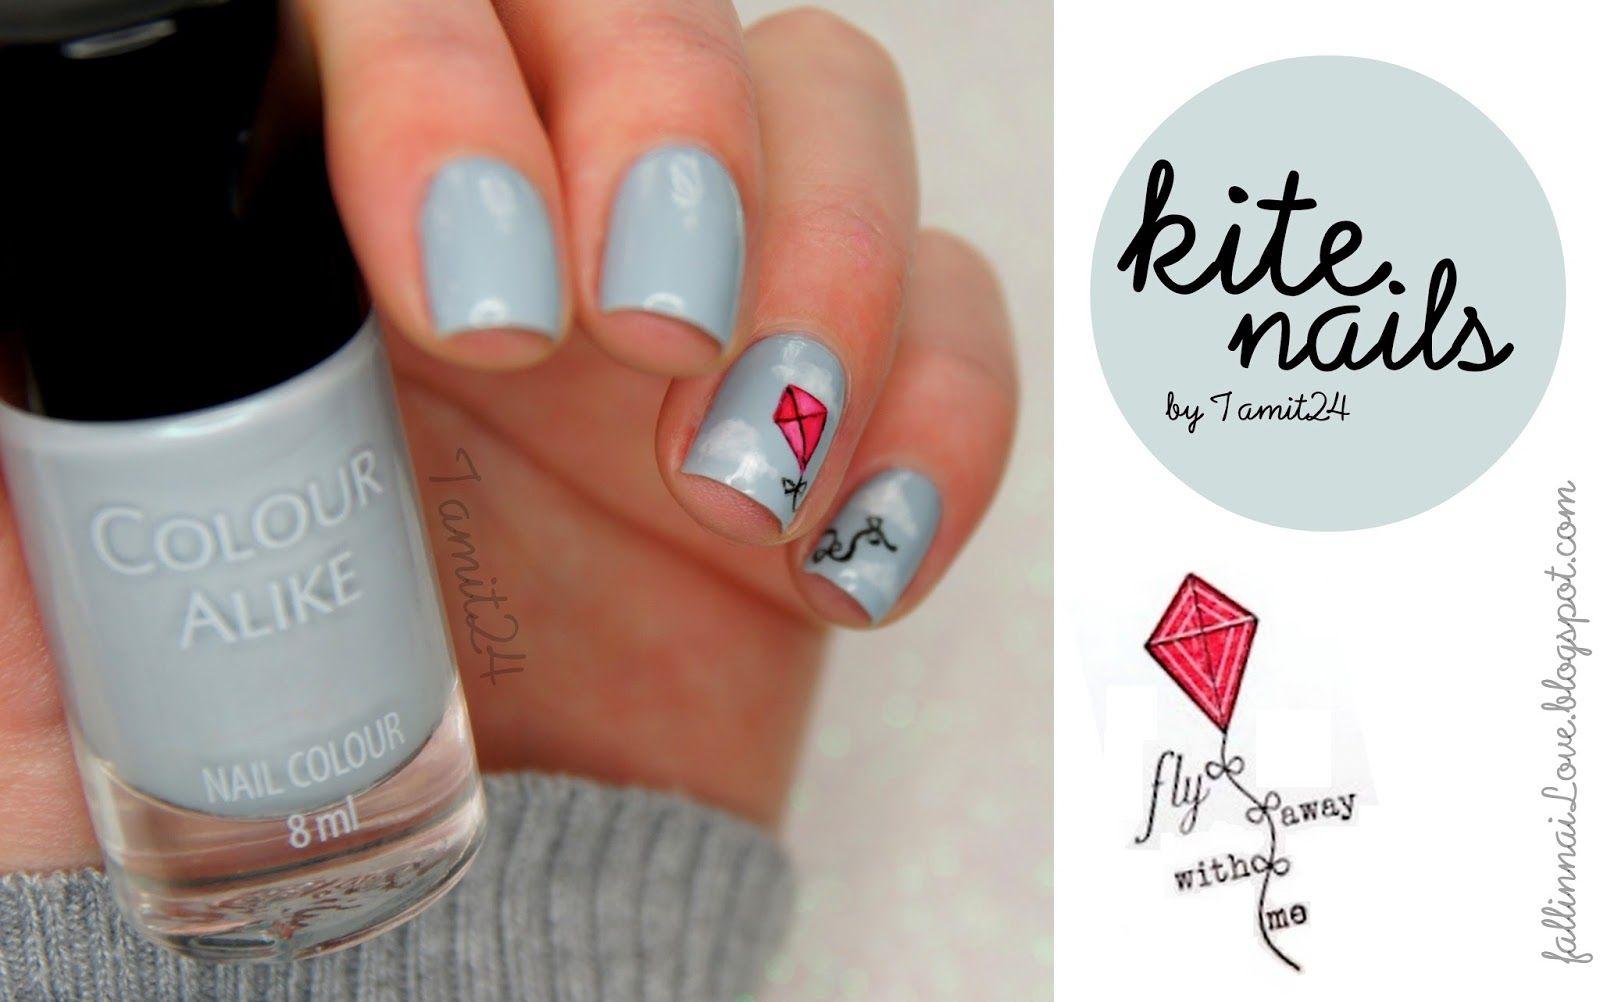 kite+nails+colour+alike+pozna%C5%84+pzn+490+drachetka+tamit24+title ...